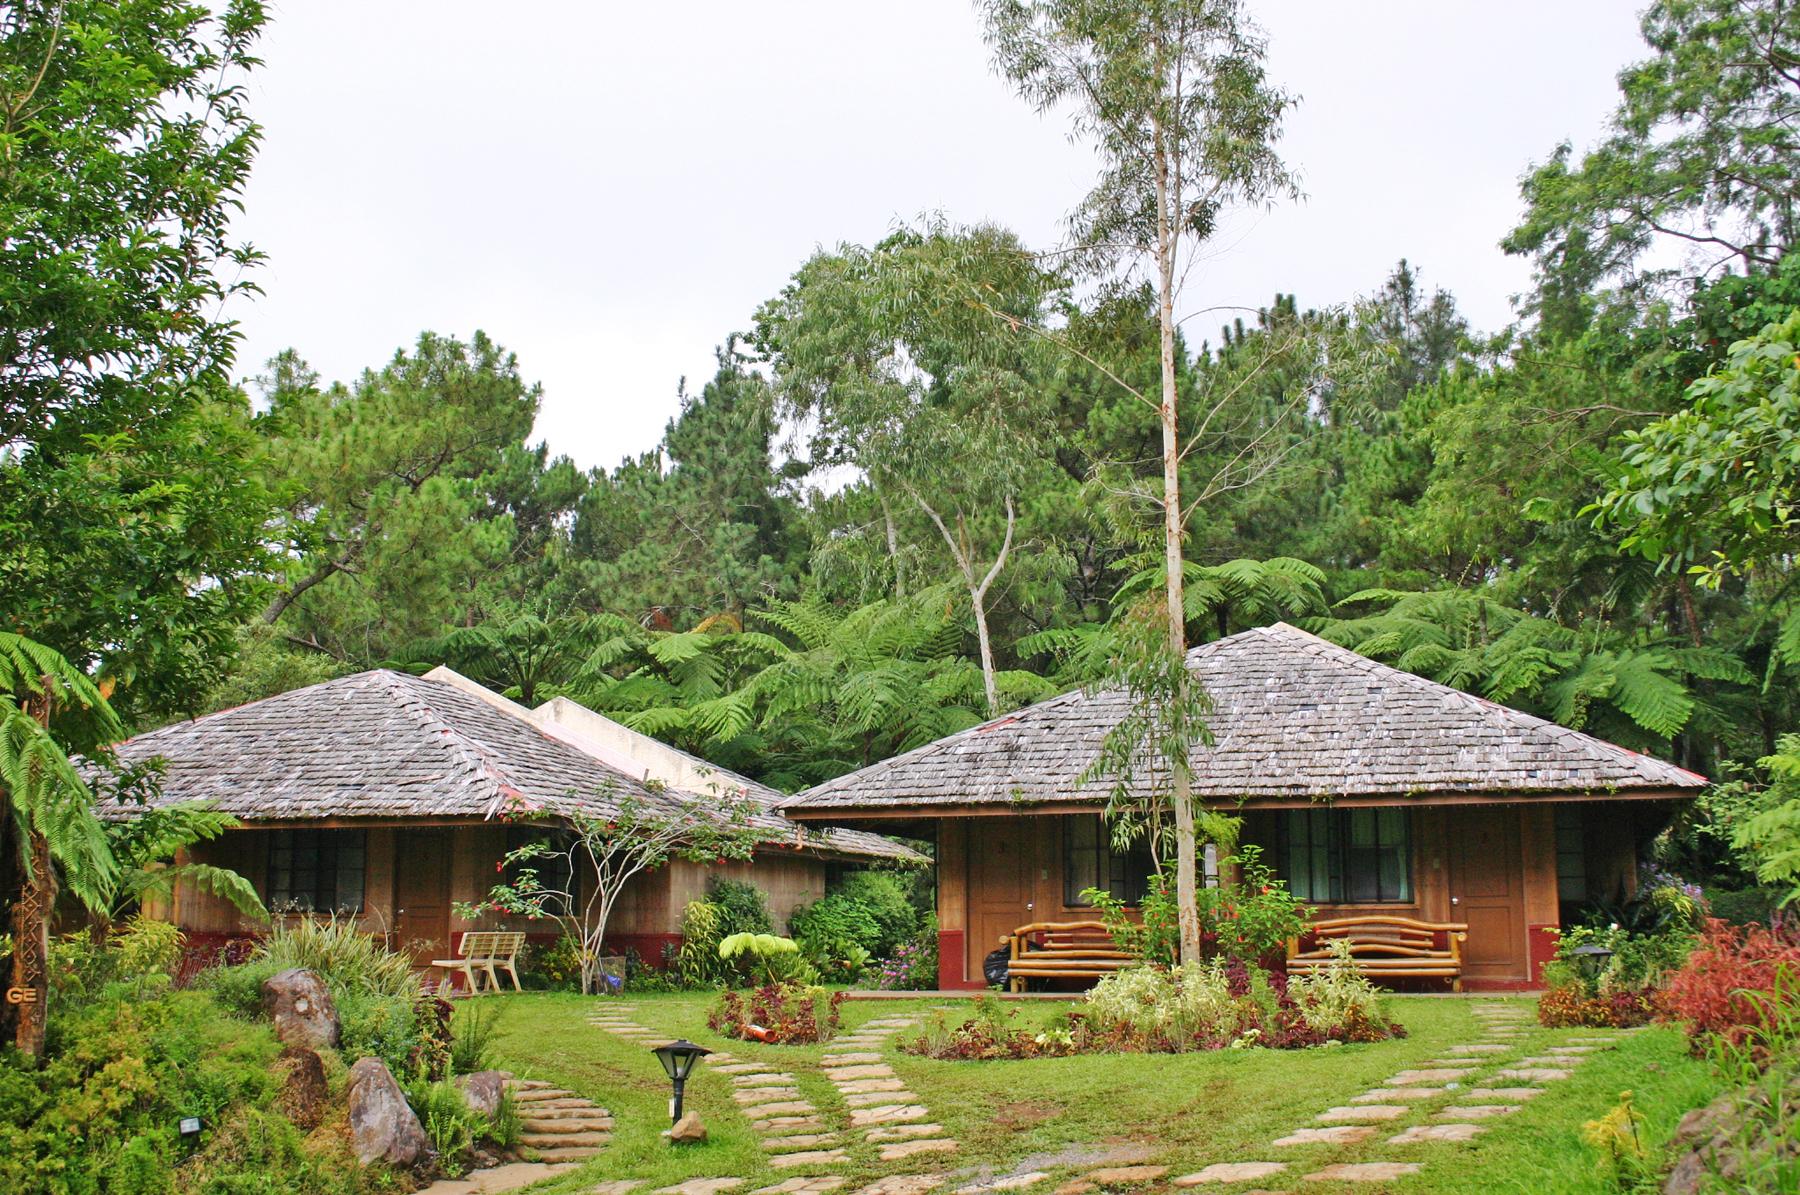 https://tourism.davaocity.gov.ph/wp-content/uploads/2018/10/IMG_5121-Copy.jpg